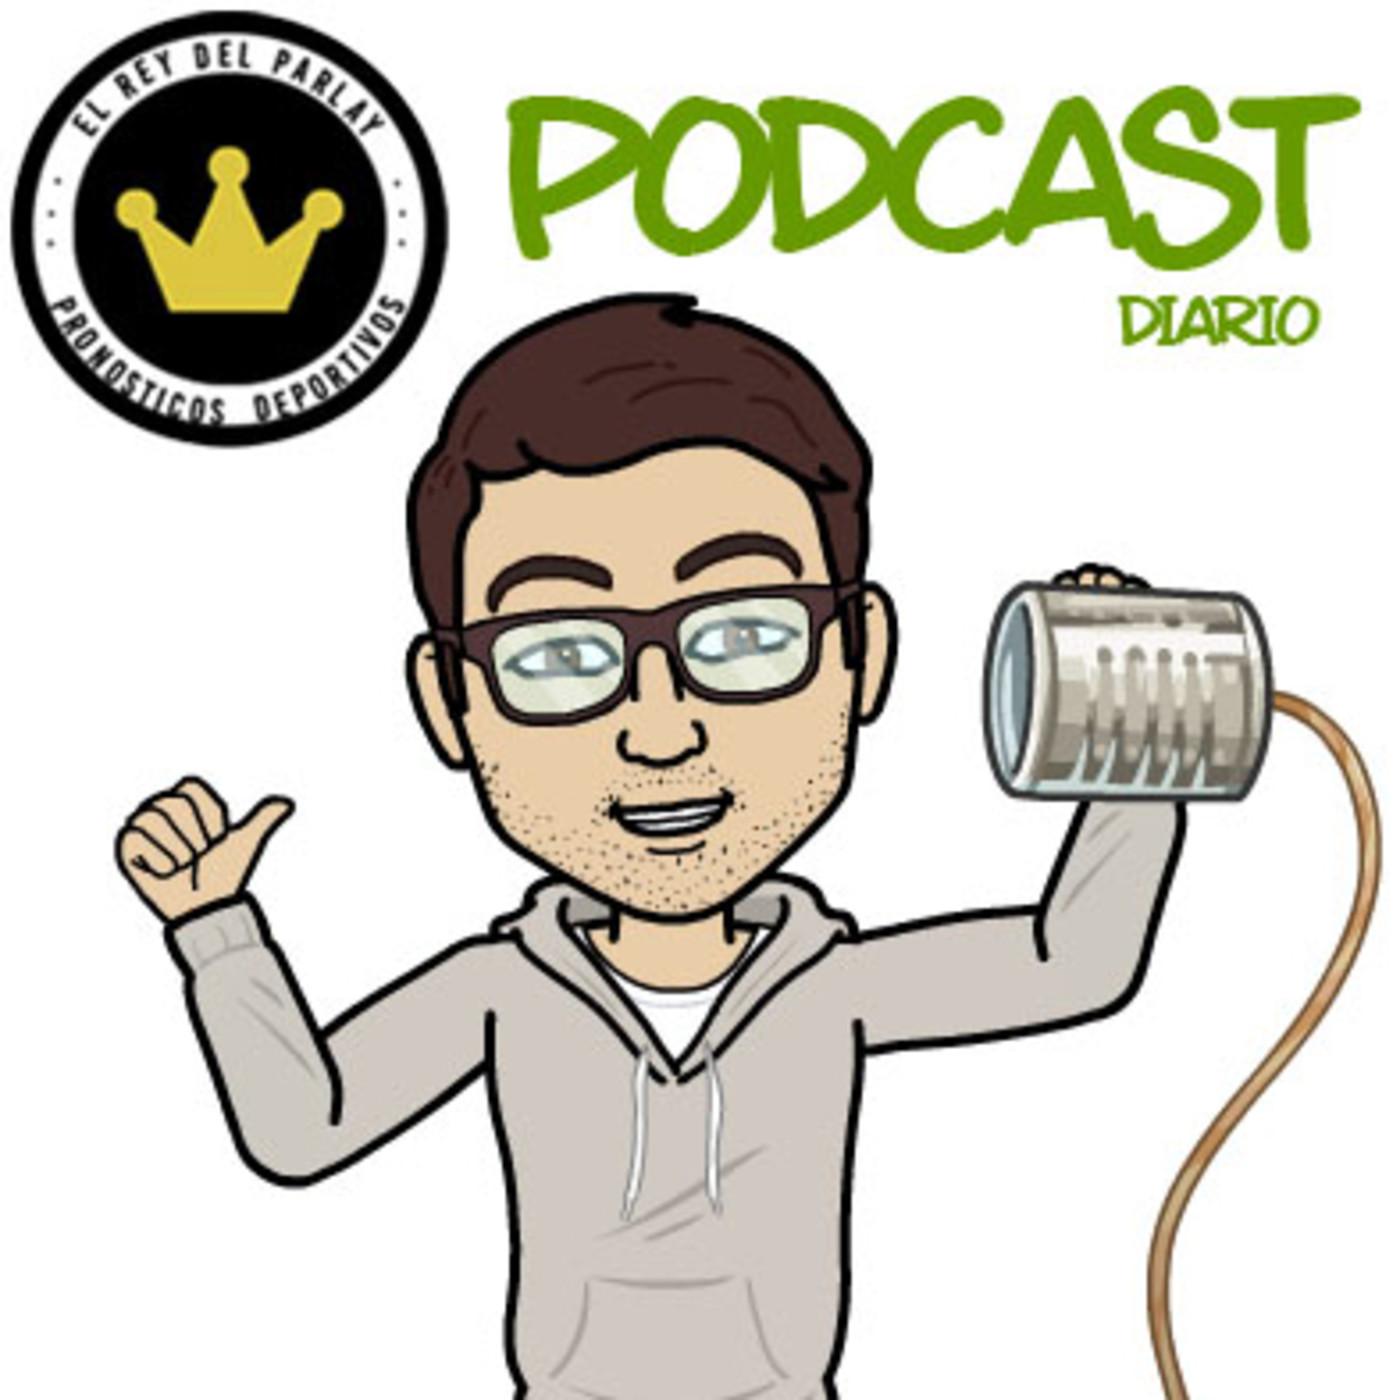 20/2/2017 Podcast Diario | NHL + NCAAB